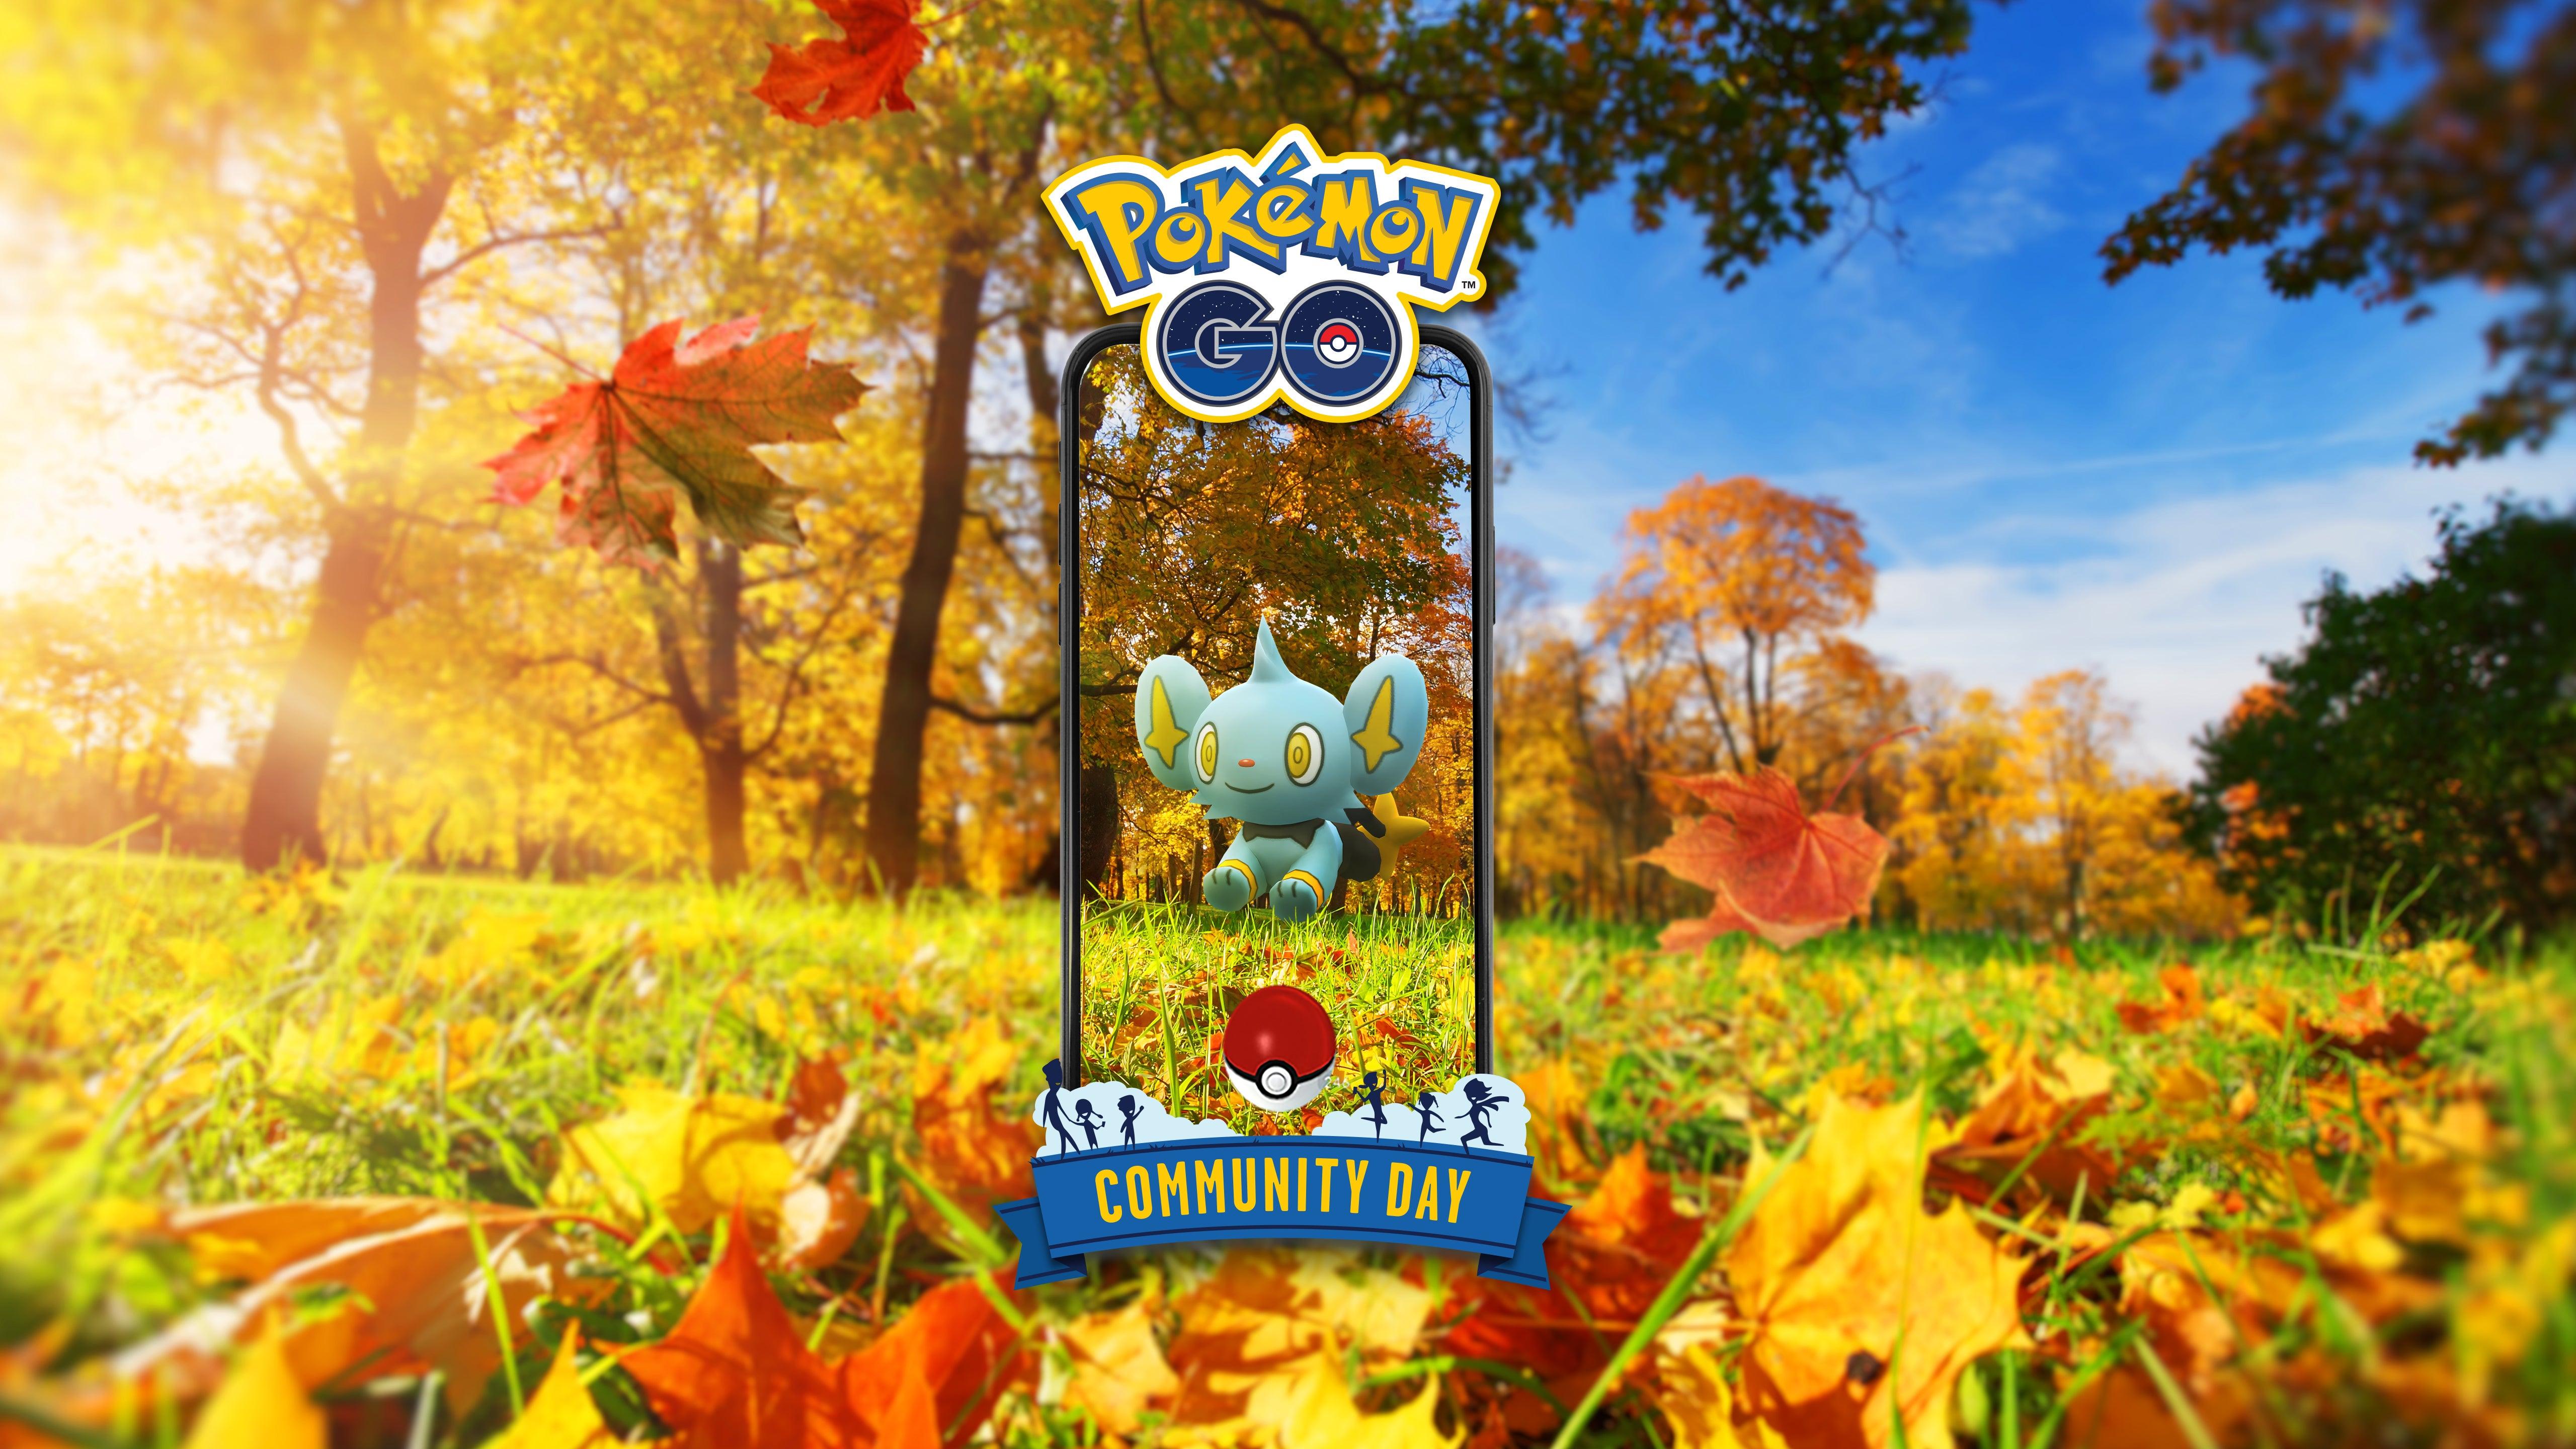 Pokemon Go Festival of Lights and Shinx Community Day coming in November - VG247